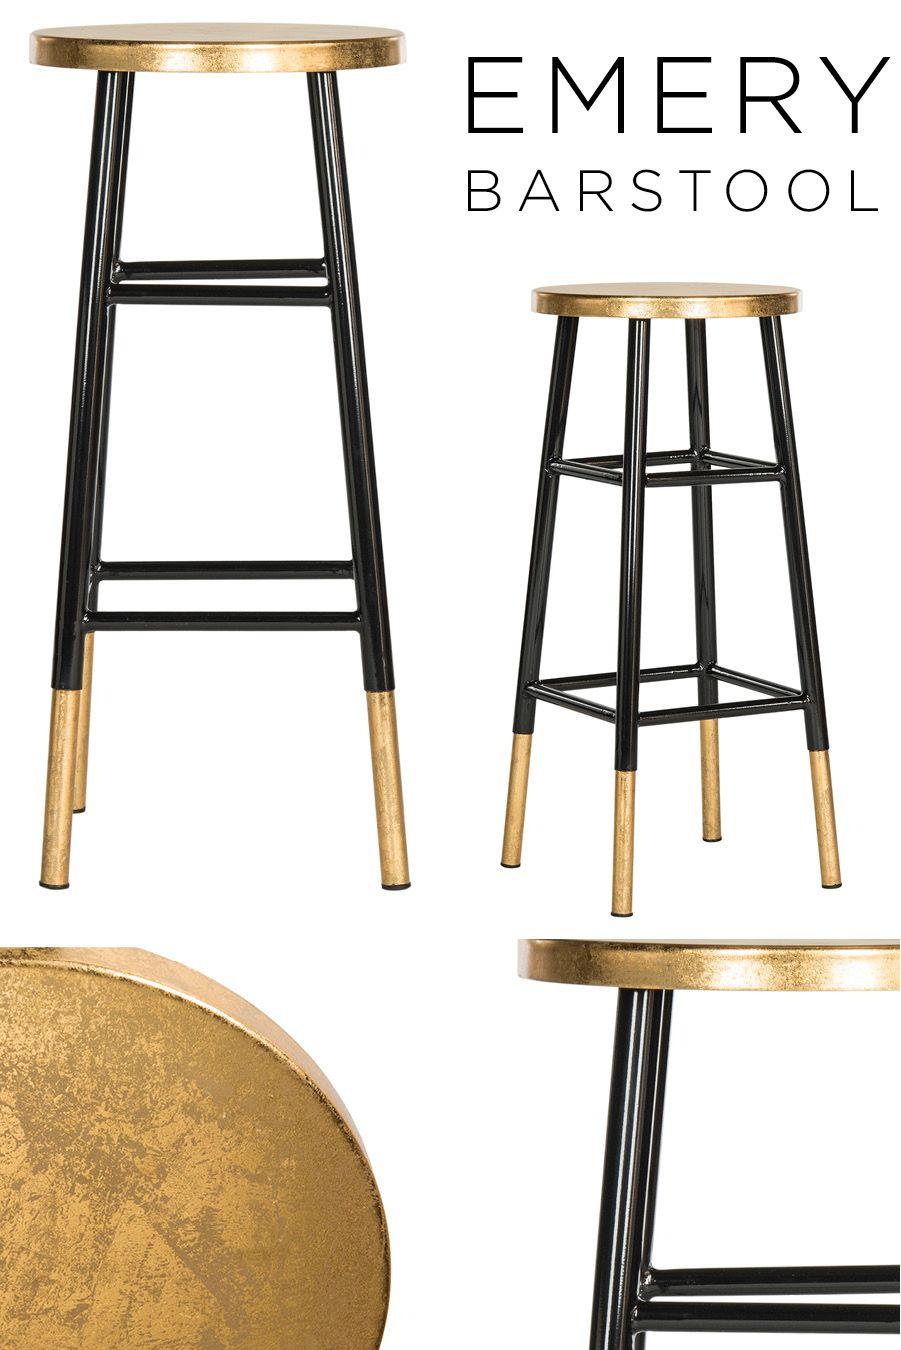 Fox3230c Bar Stools Furniture By Trending Item Emery